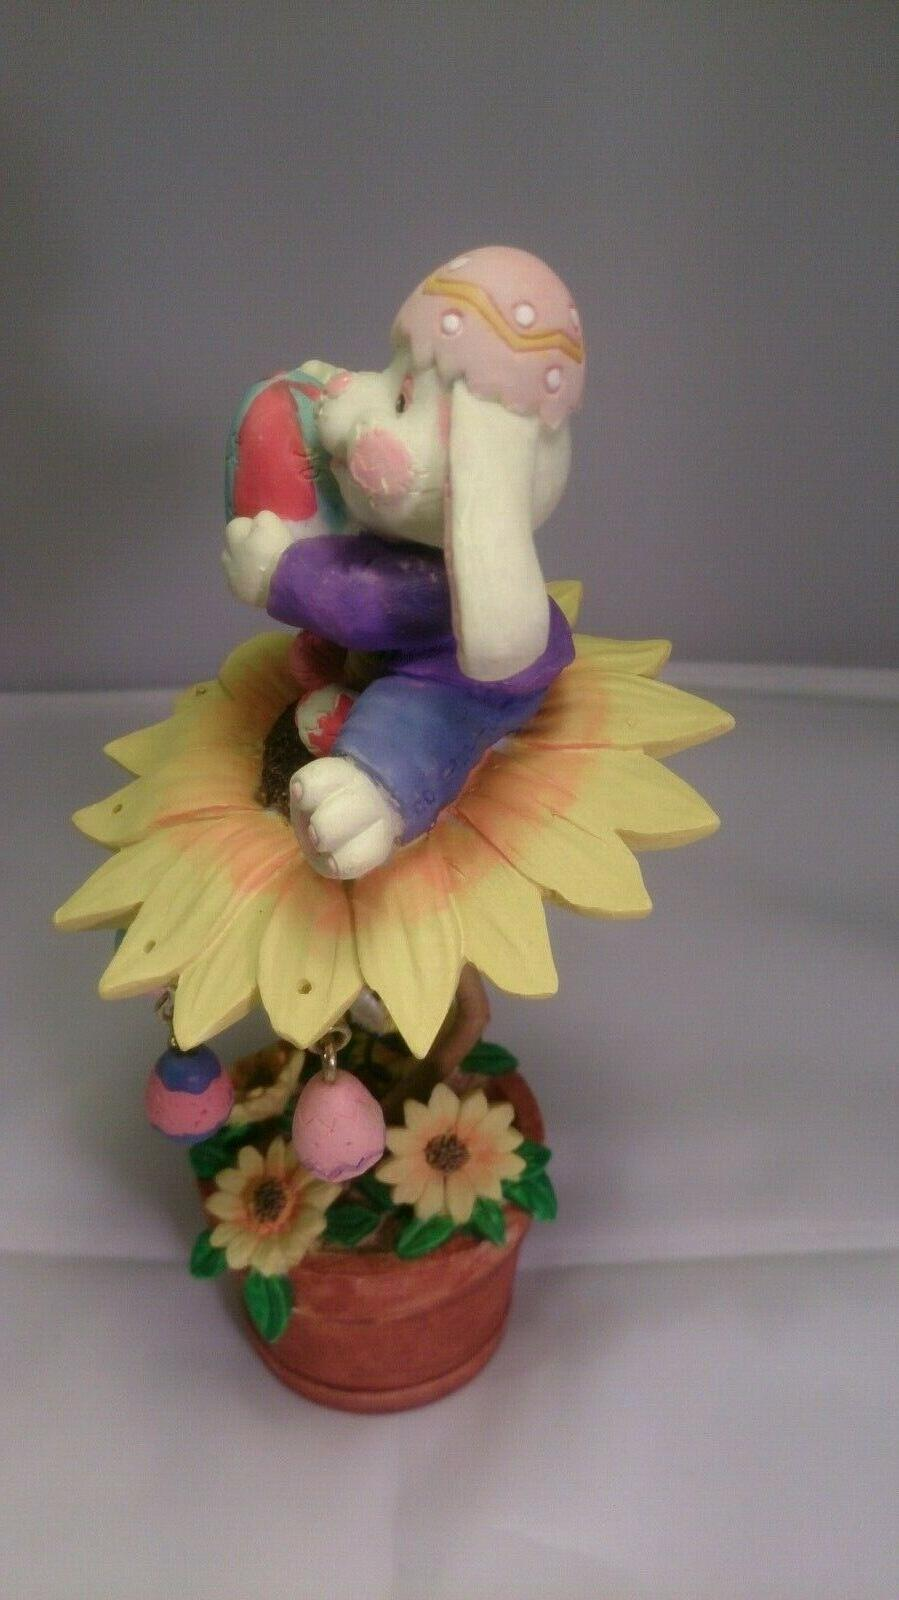 "7"" Easter ceramic figurine decor"